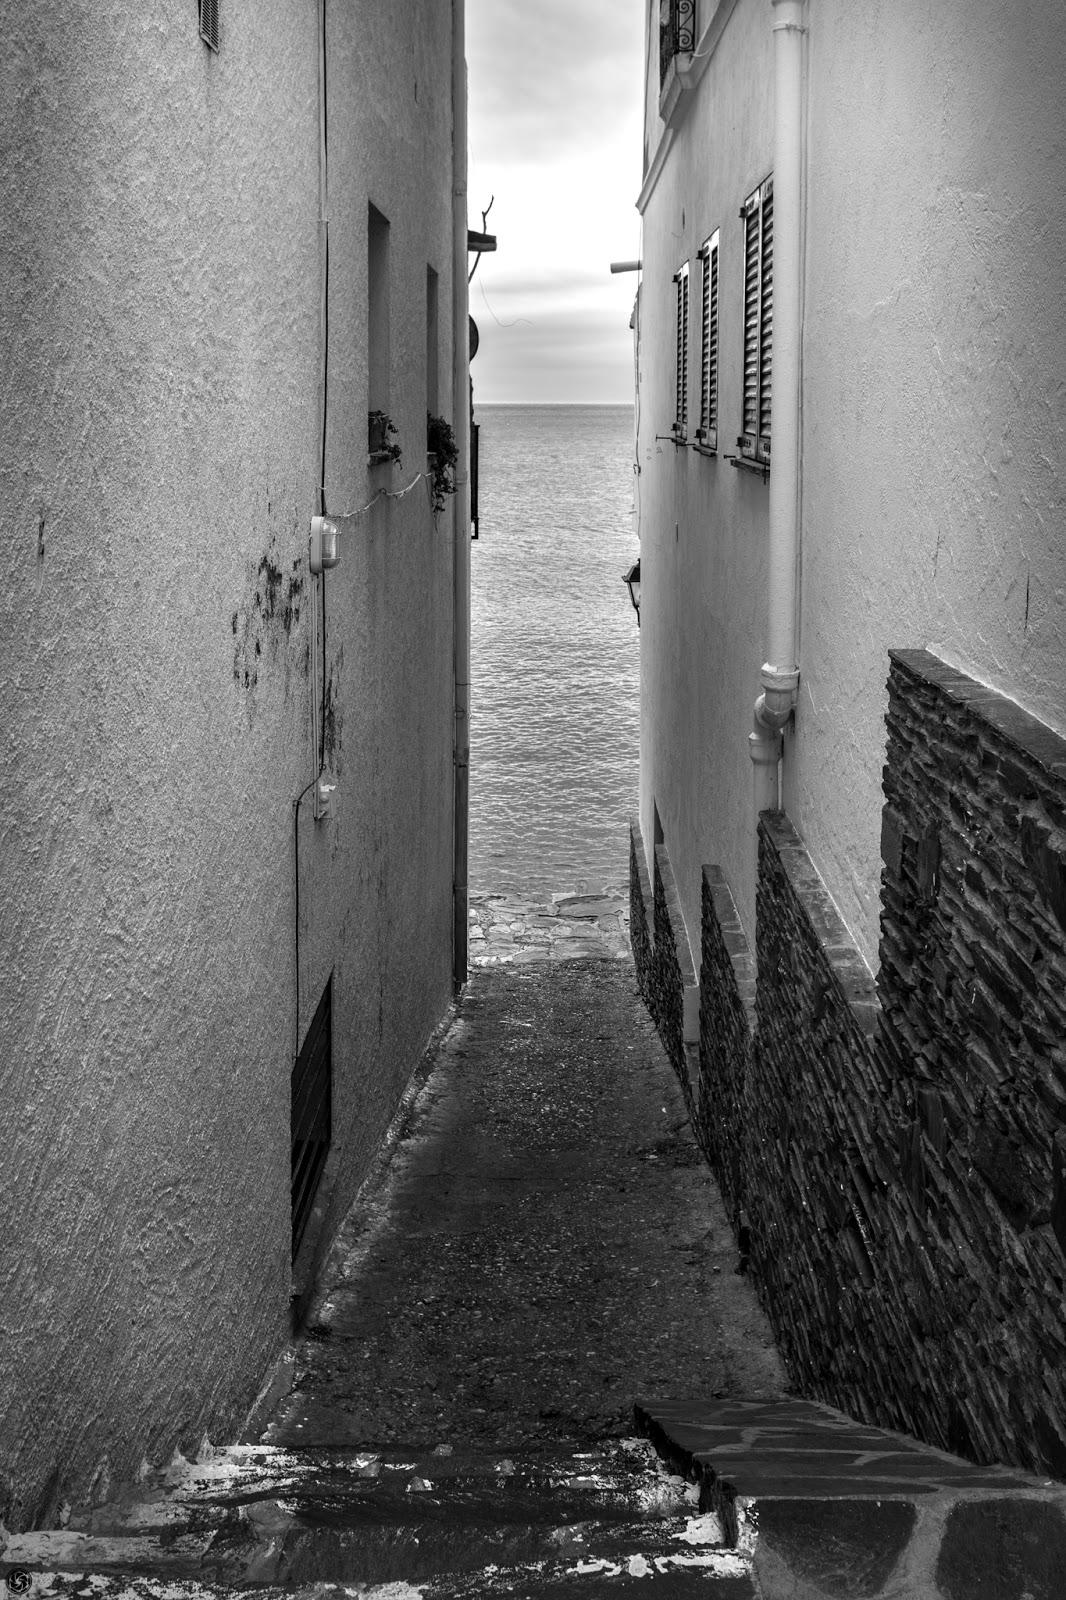 Callejón al mar :: Canon EOS 5D MkIII | ISO100 | Canon 24-105 @32mm | f/8.0 | 1/40s